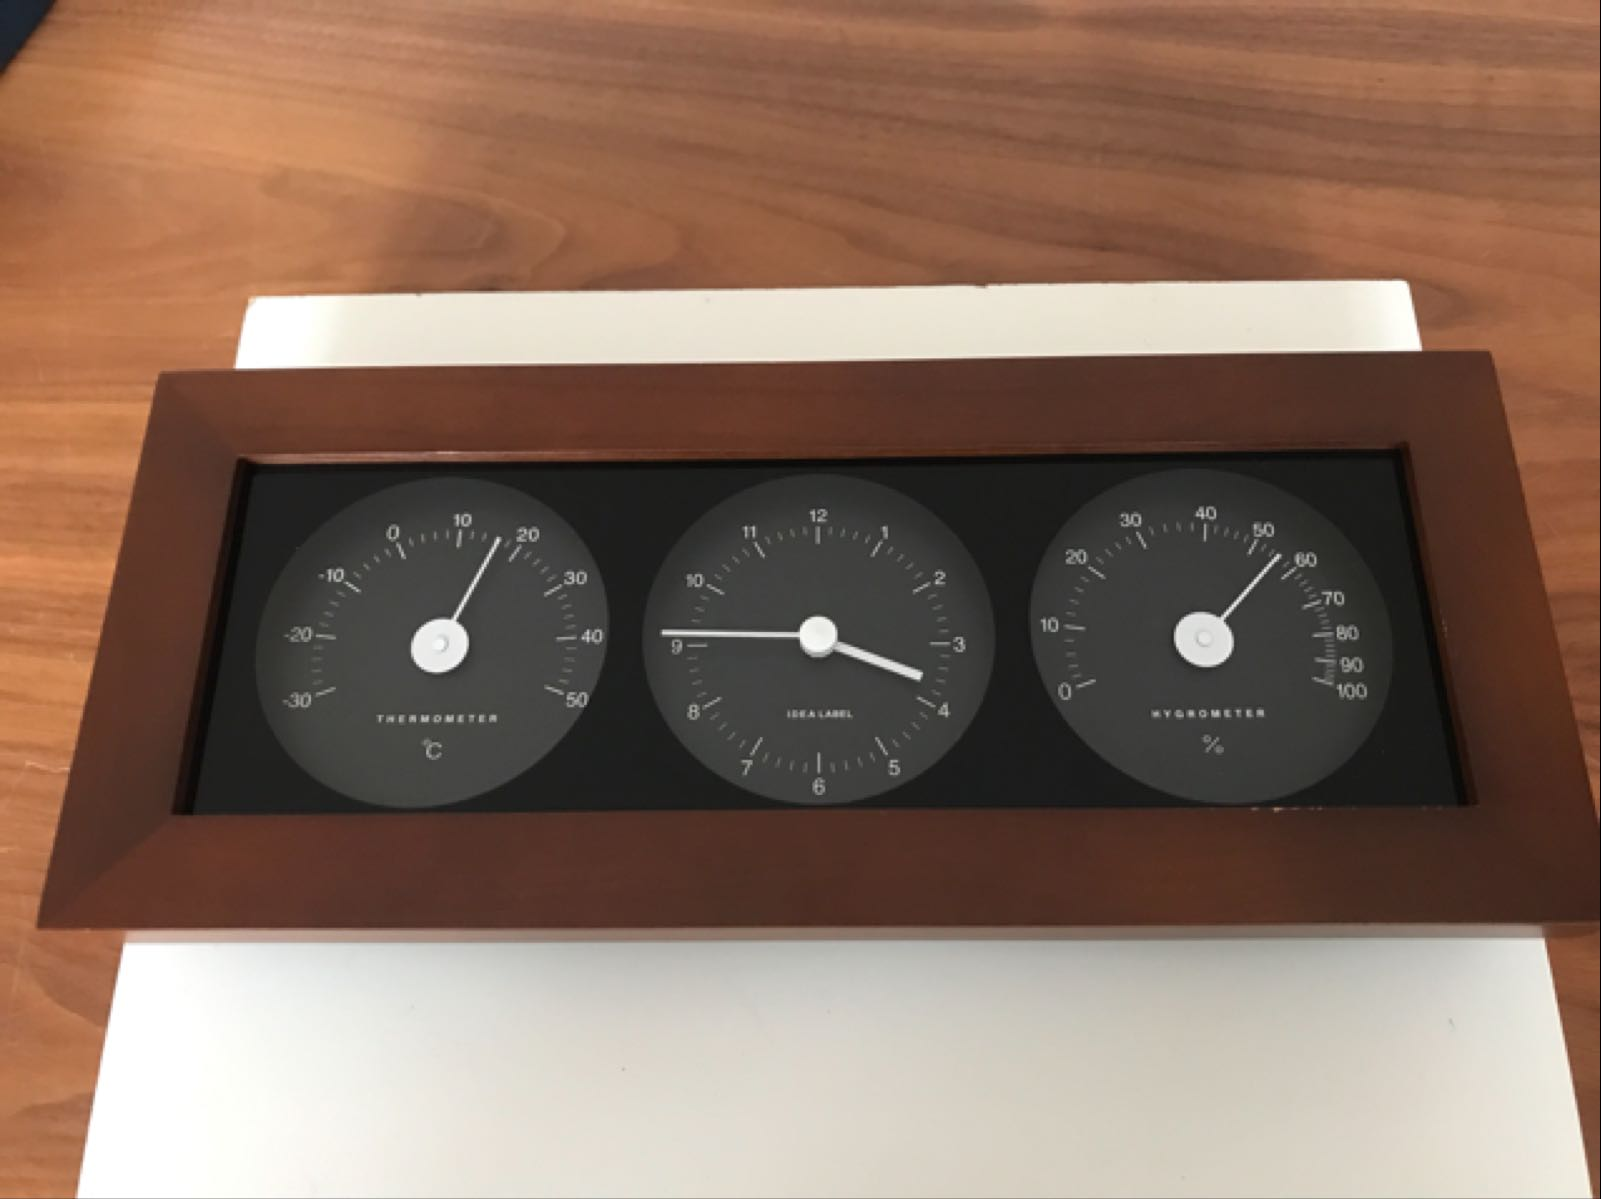 Idea International Clock, Thermometer & Hygrometer